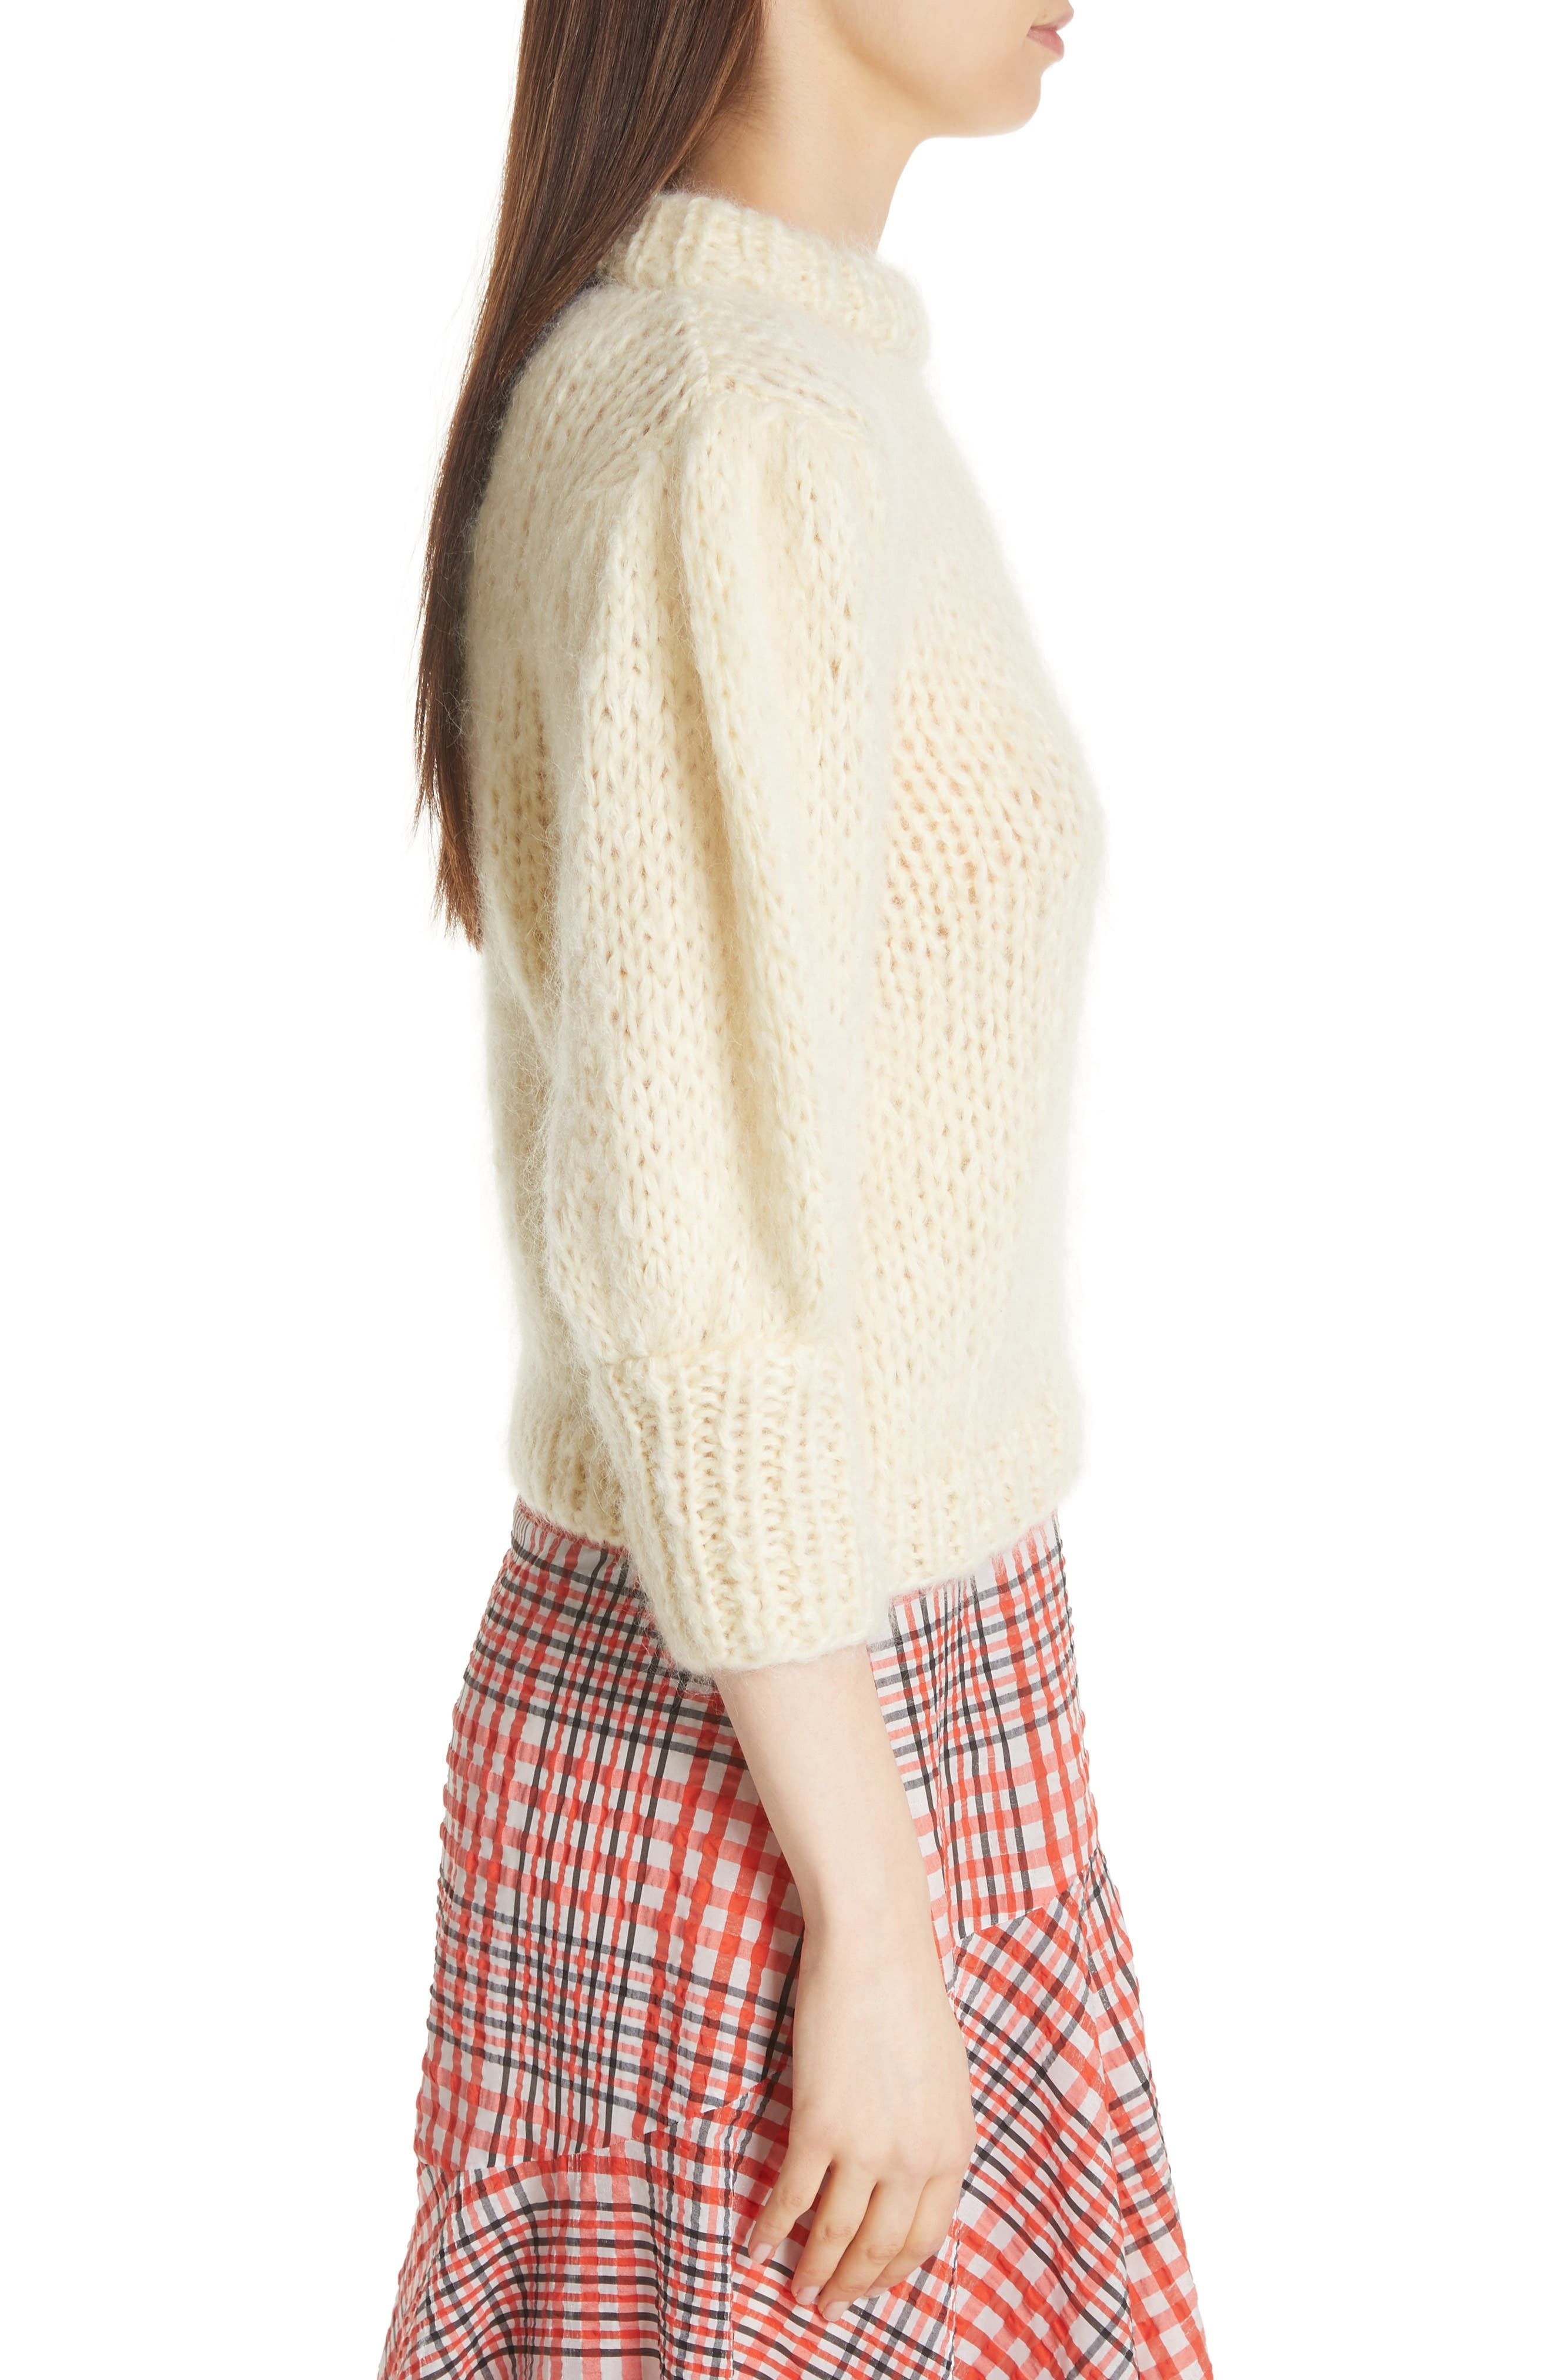 Juilliard Mohair & Wool Puff Sleeve Sweater,                             Alternate thumbnail 3, color,                             900